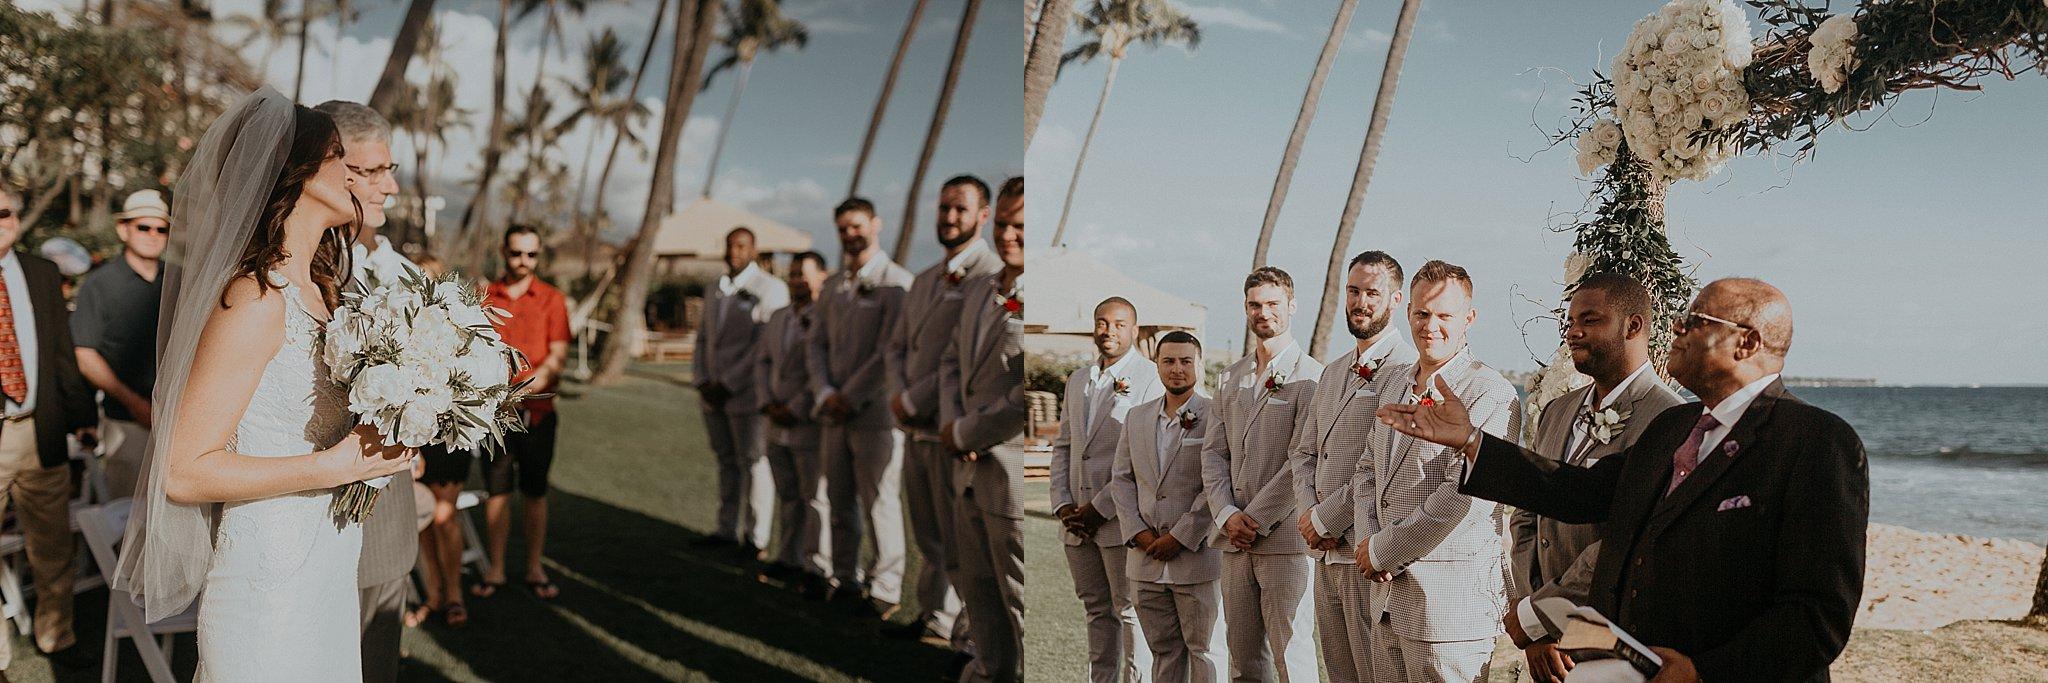 samantha_mcfarlen_bellingham_washington_engagement_photography_seattle_wedding_photographer_0203.jpg